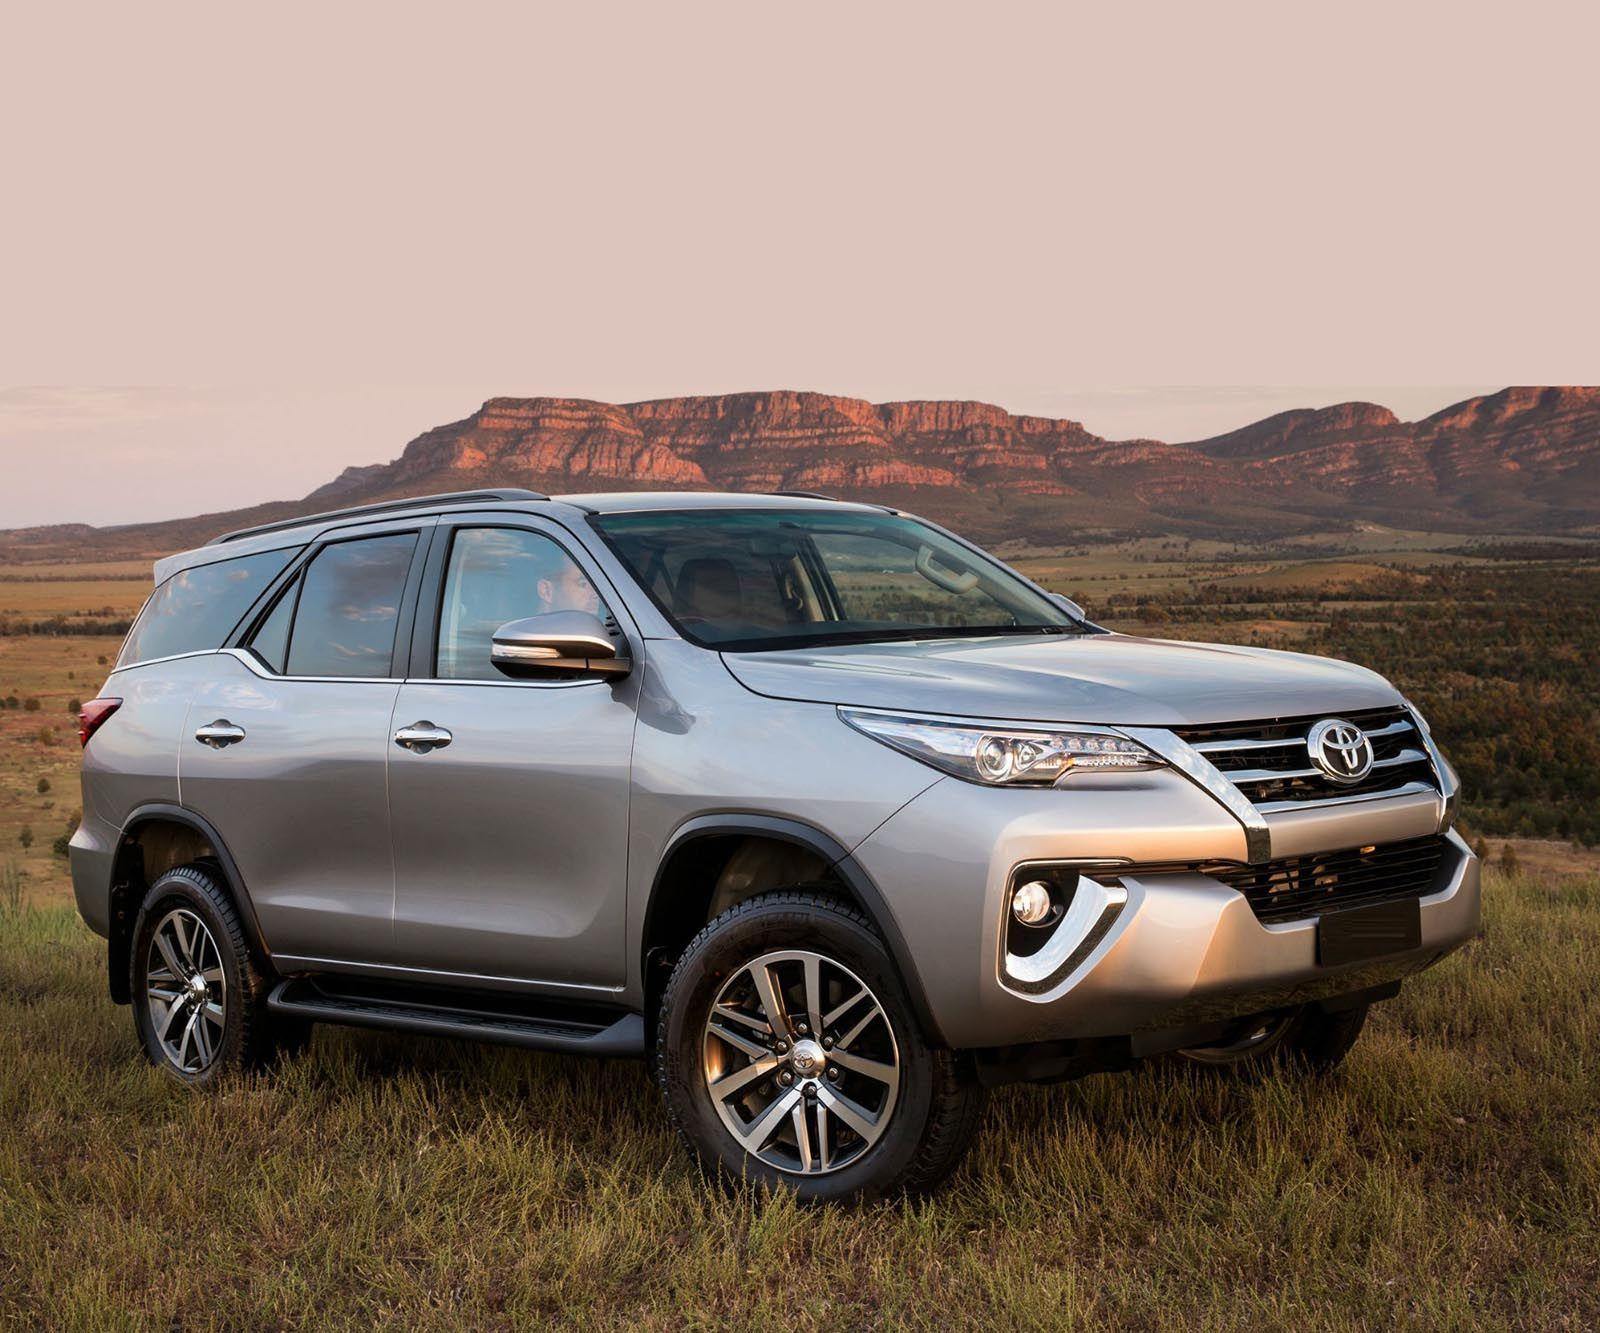 2017 Toyota 4runner Interior Pinterest And Vehicle